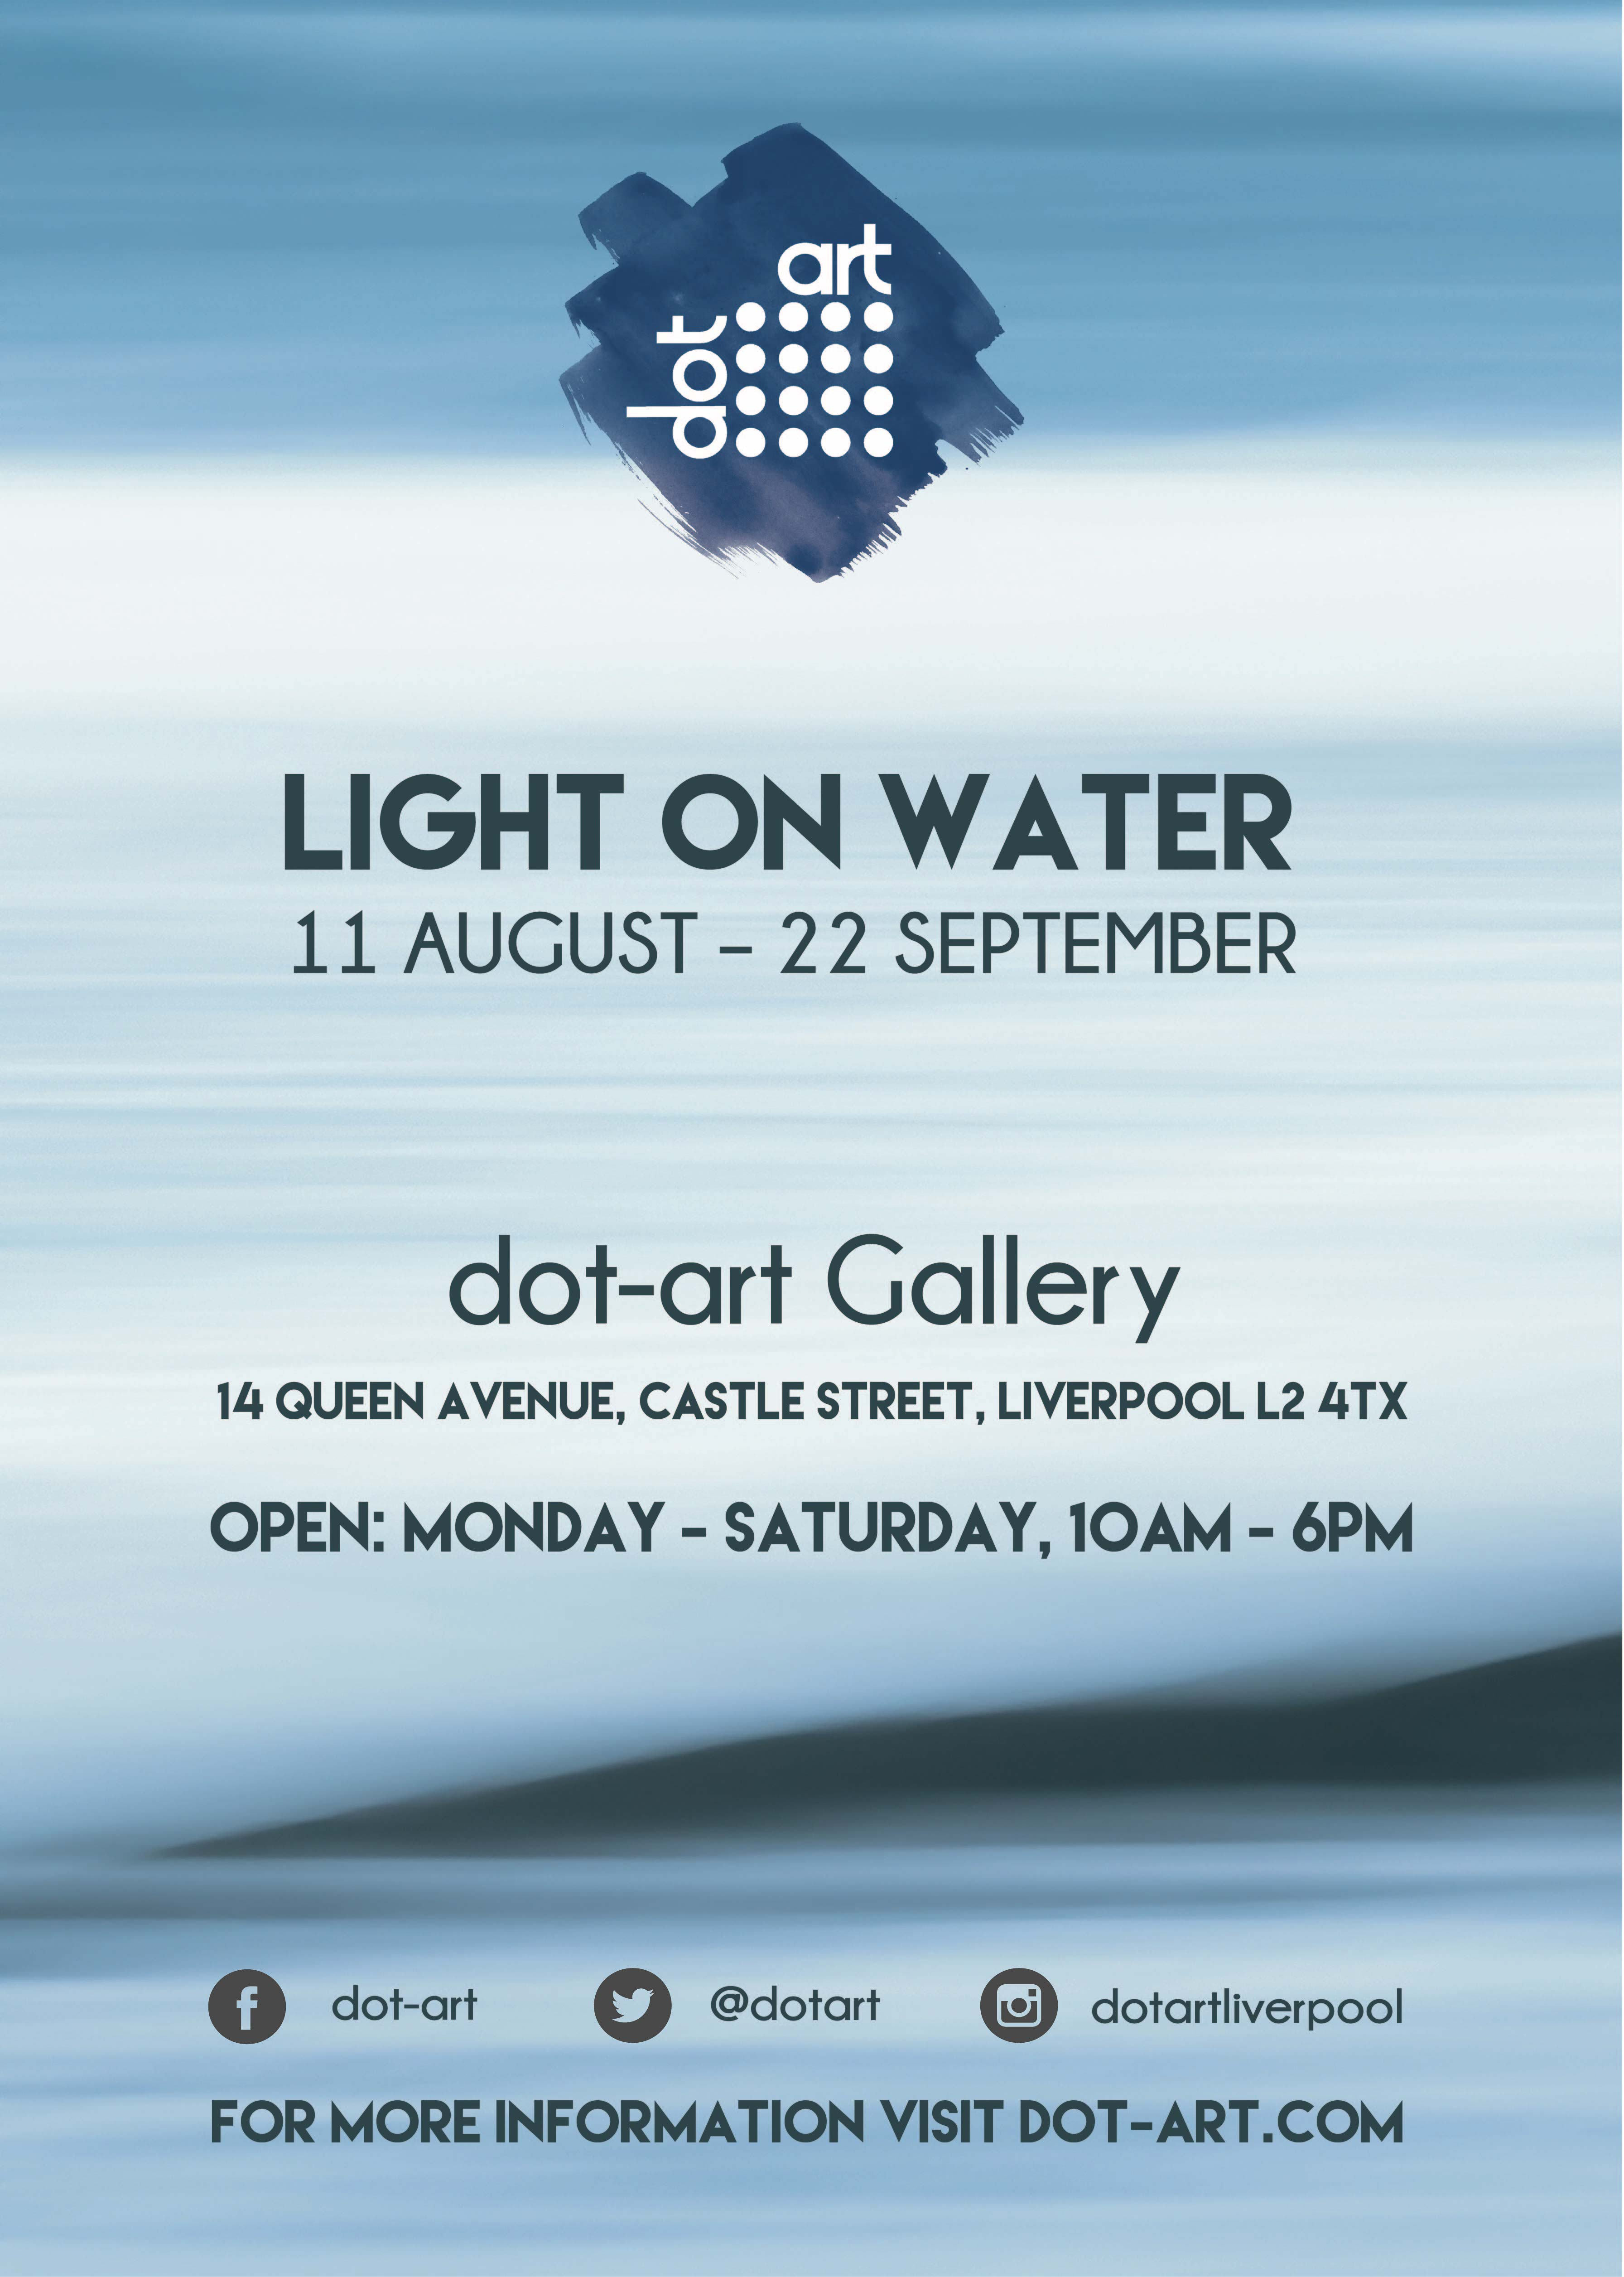 IB18: dot-art: Light on Water